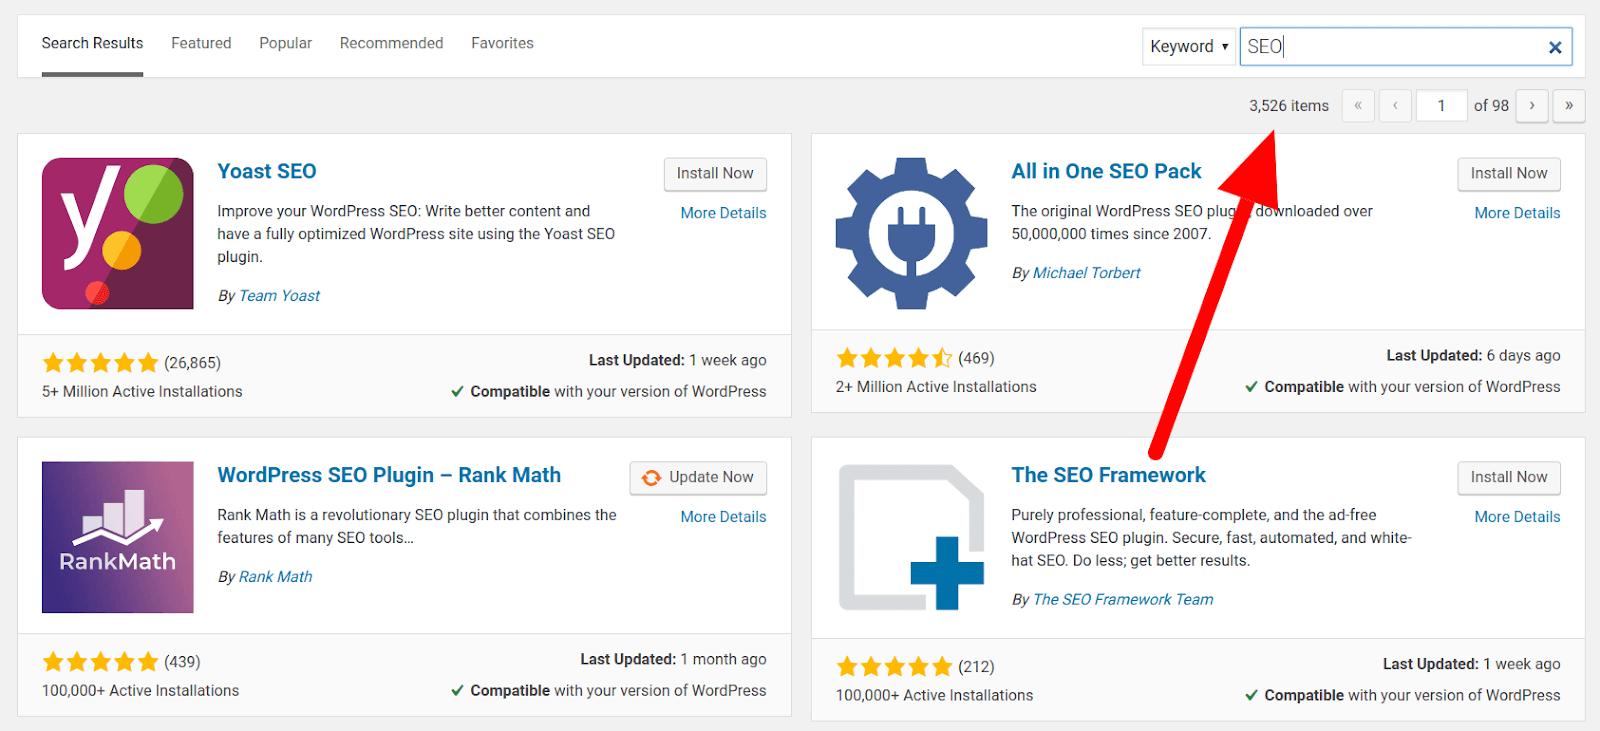 SEO Plugins on WordPress